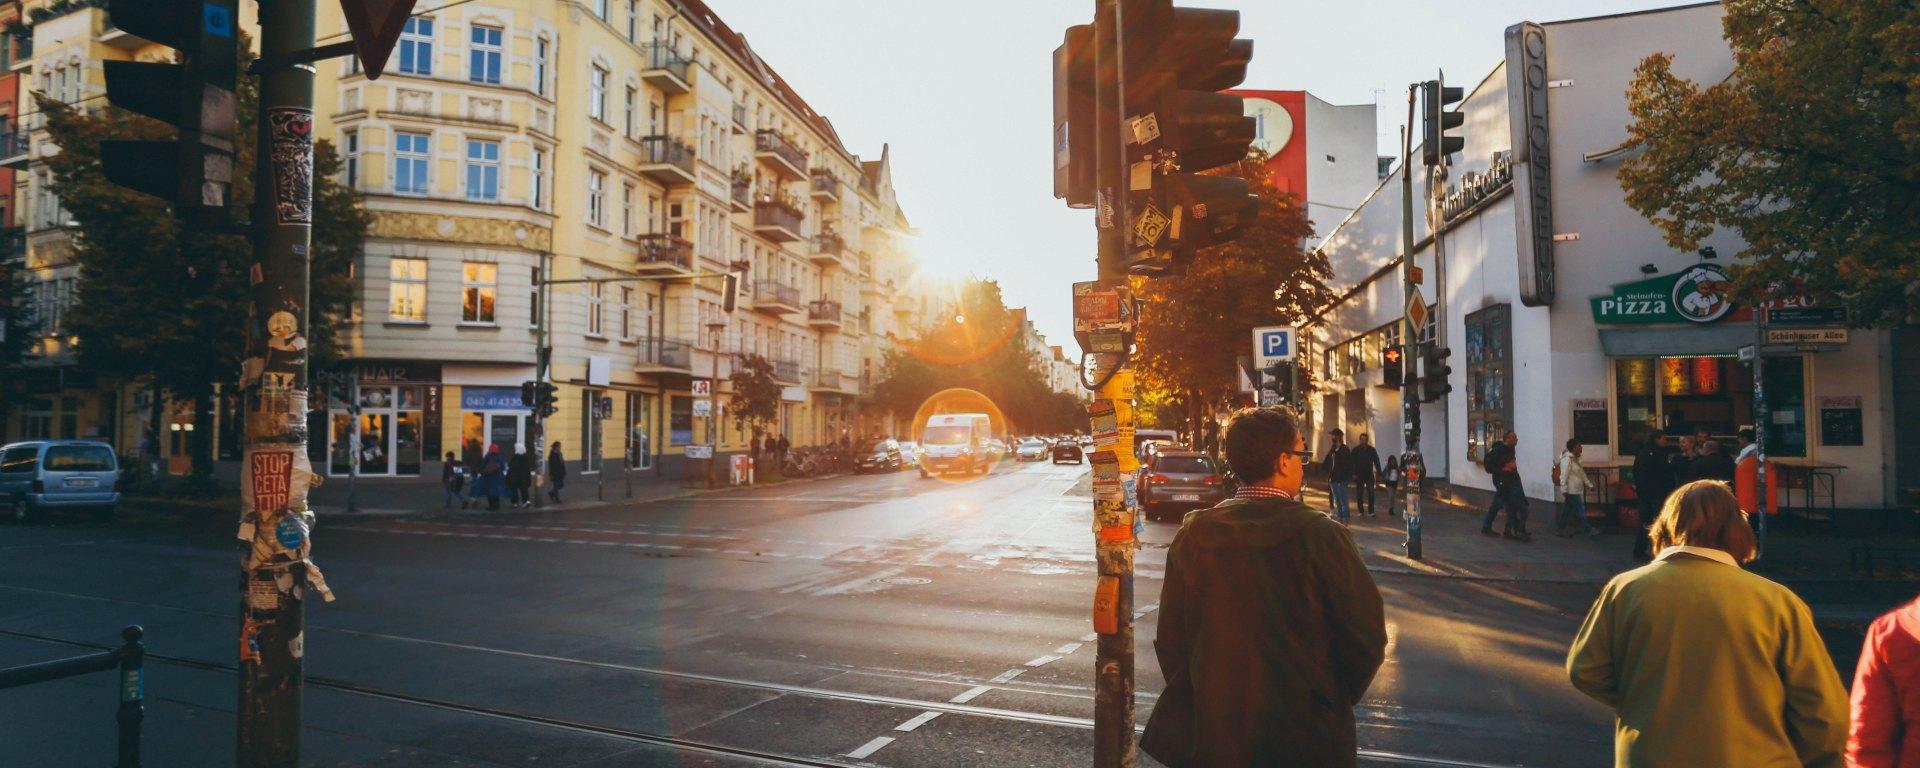 36 Hours in Berlin